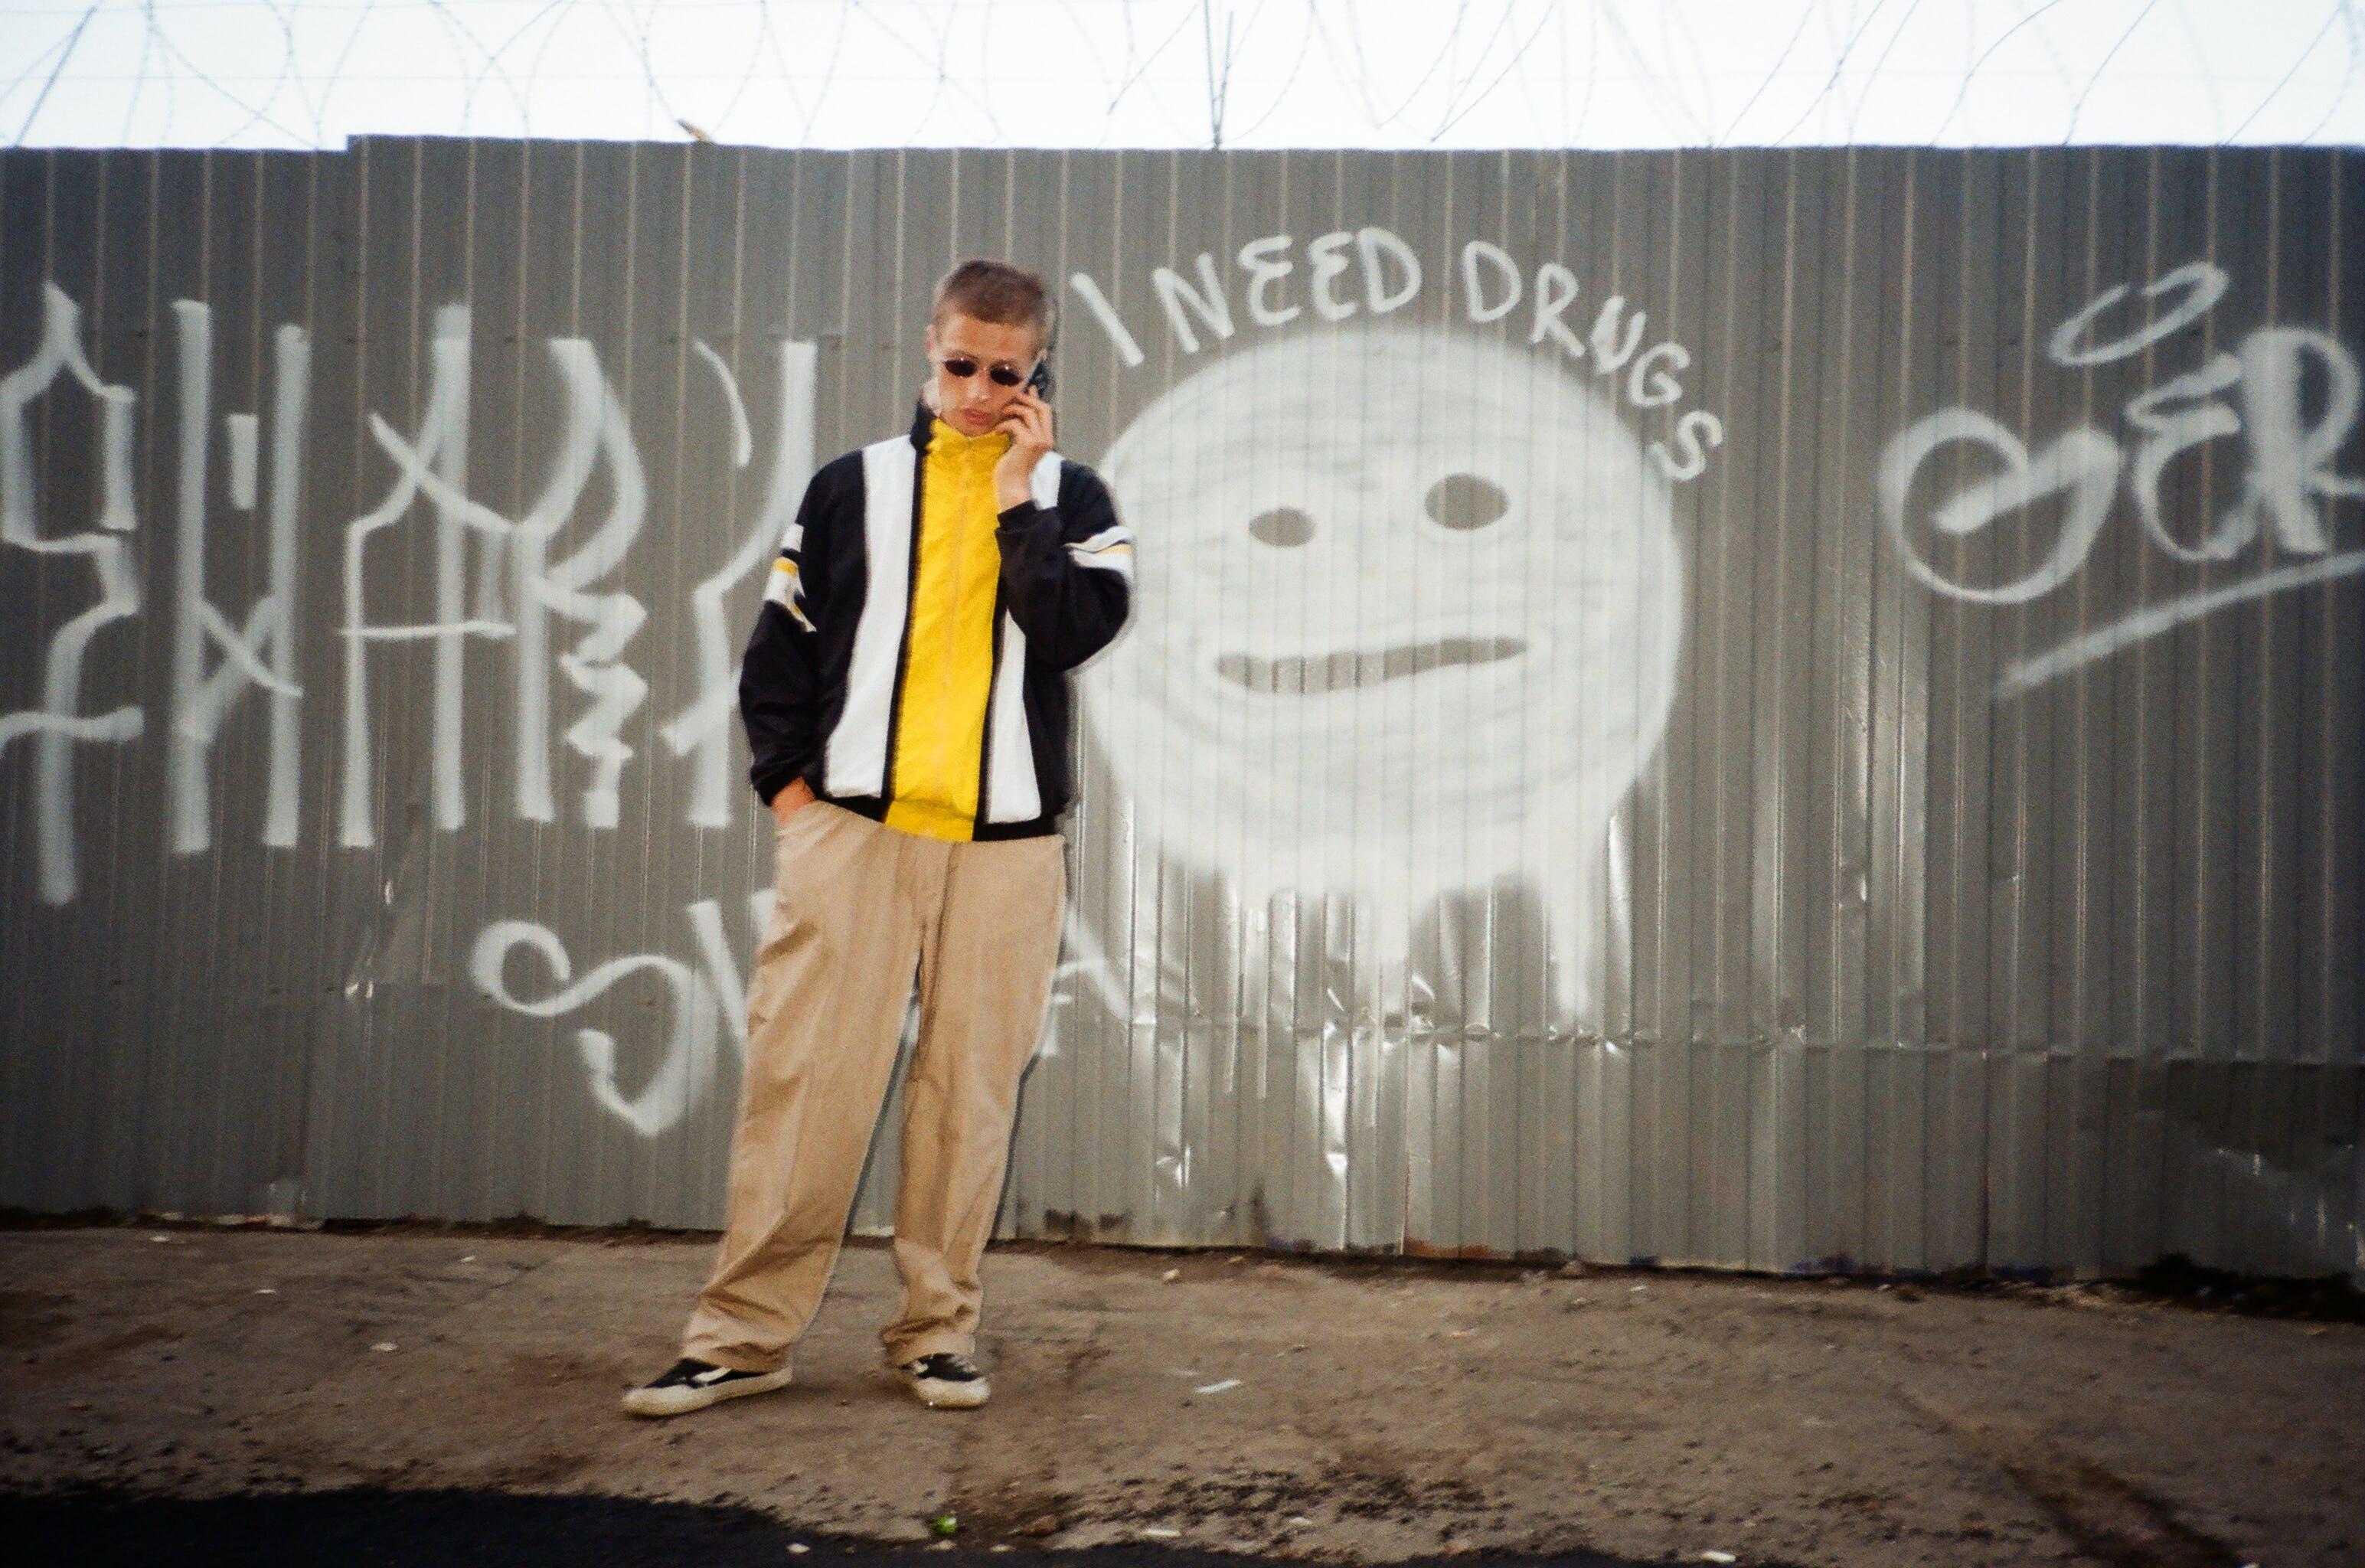 Fotos de stock gratuitas de atuendo, calle, carretera, graffiti